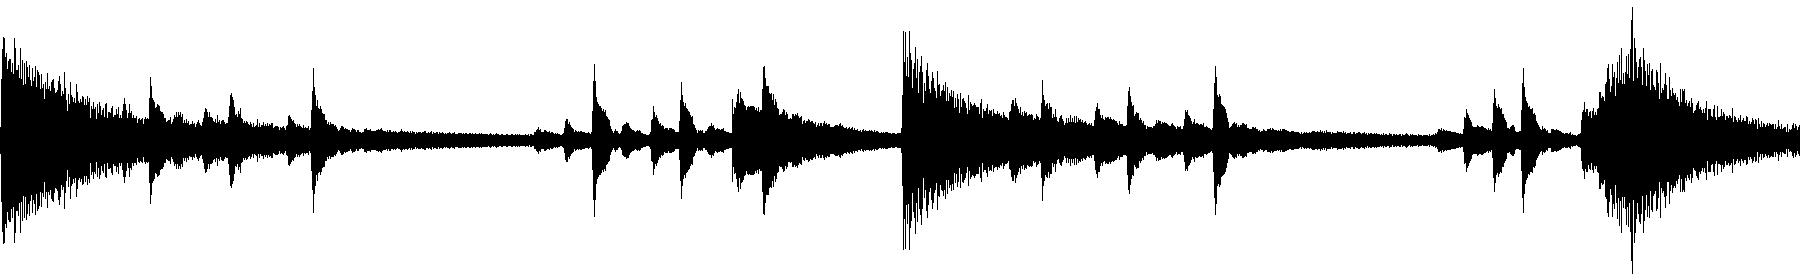 80 g piano youjacuzzi 02